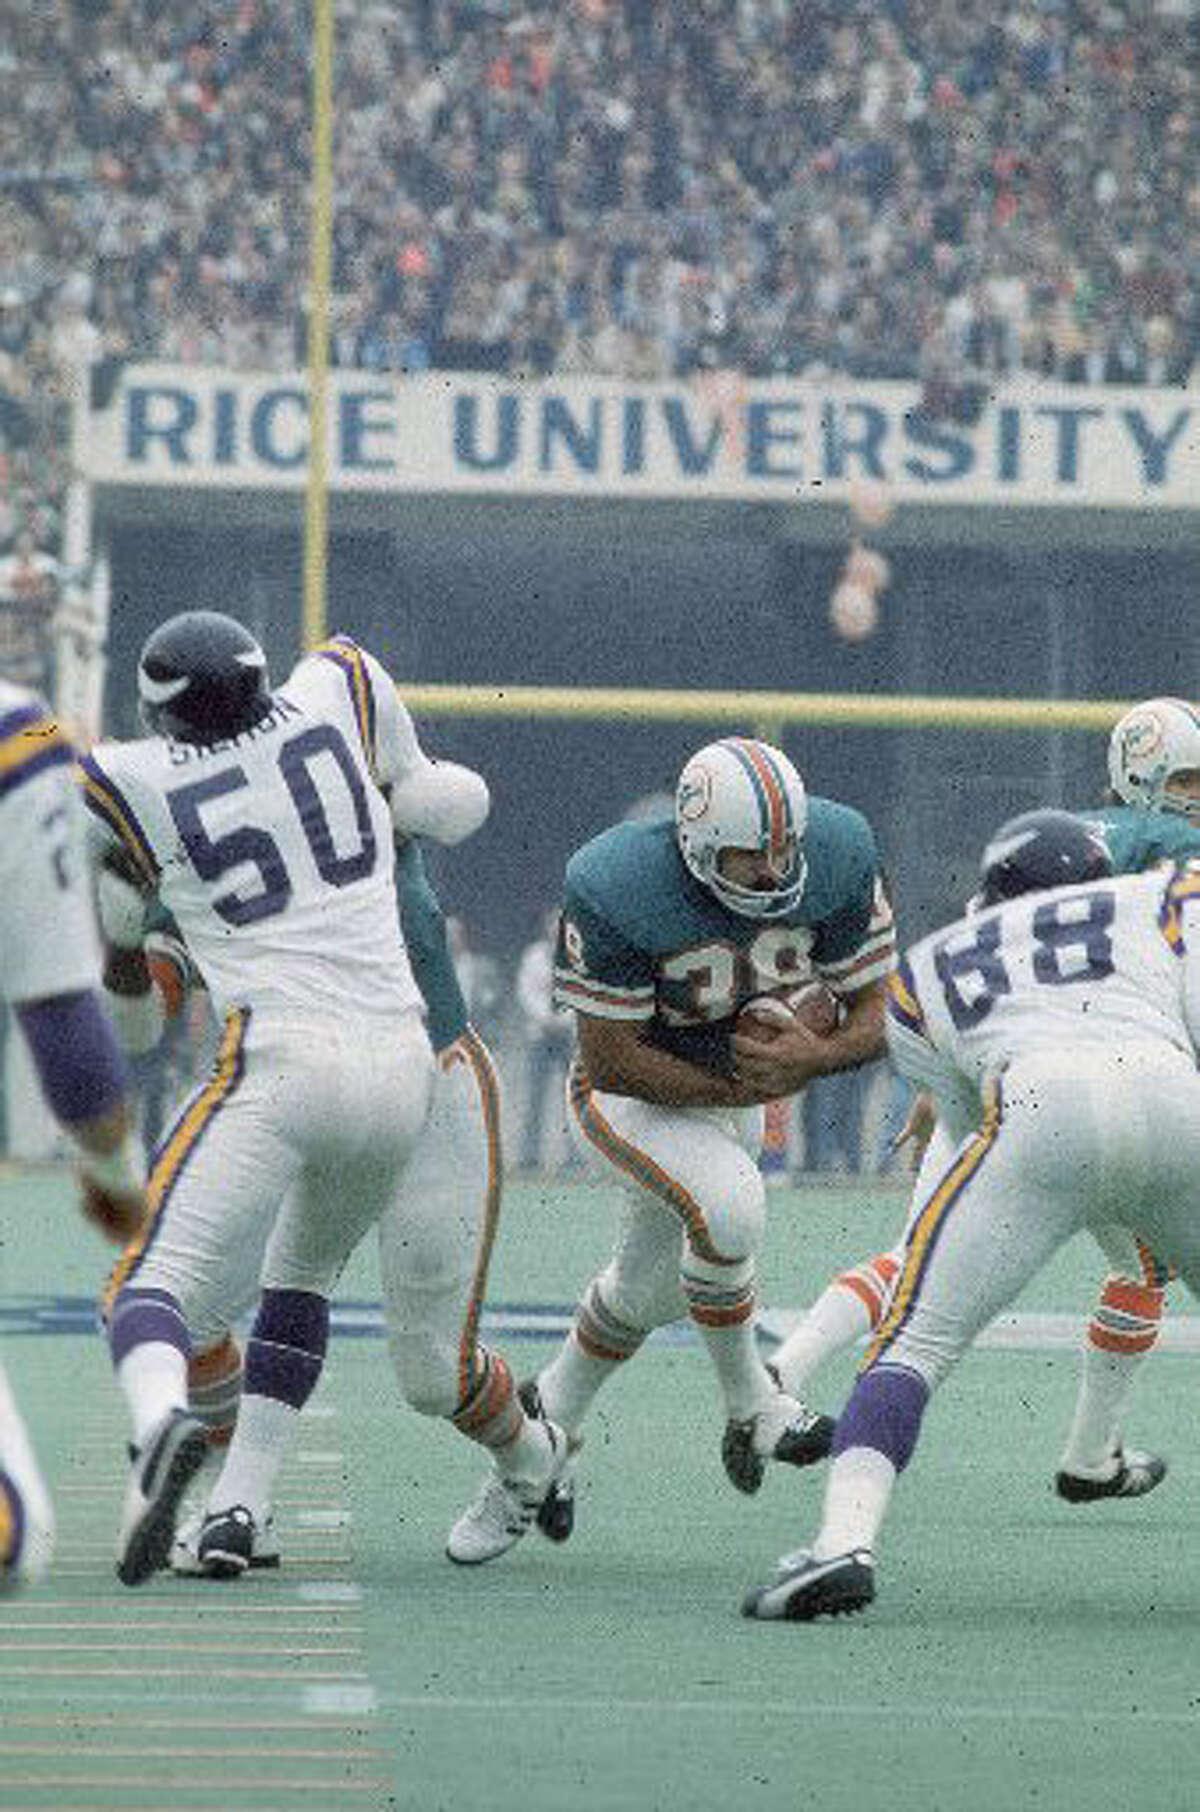 HOUSTON SUPER BOWL AT RICE STADIUM - 01/13/1974 - Miami Dolphins Larry Csonka (39) runs for yards in Super Bowl VIII Pro Football: Super Bowl VIII. Credit: James Drake, Sports Illustrated SetNumber: X18333 R1 F25